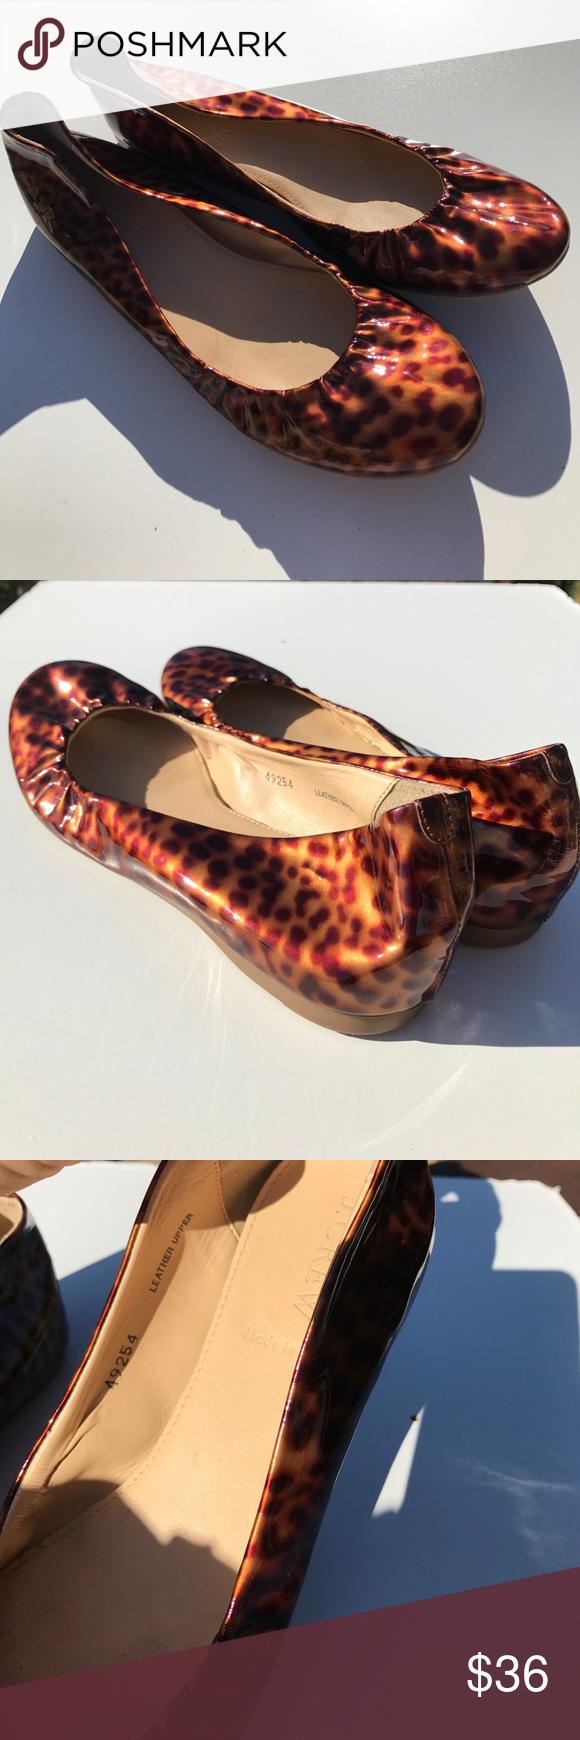 J. Crew Patent Leather Leopard Ballet Flats 7 Light wear. J. Crew Shoes Flats & Loafers